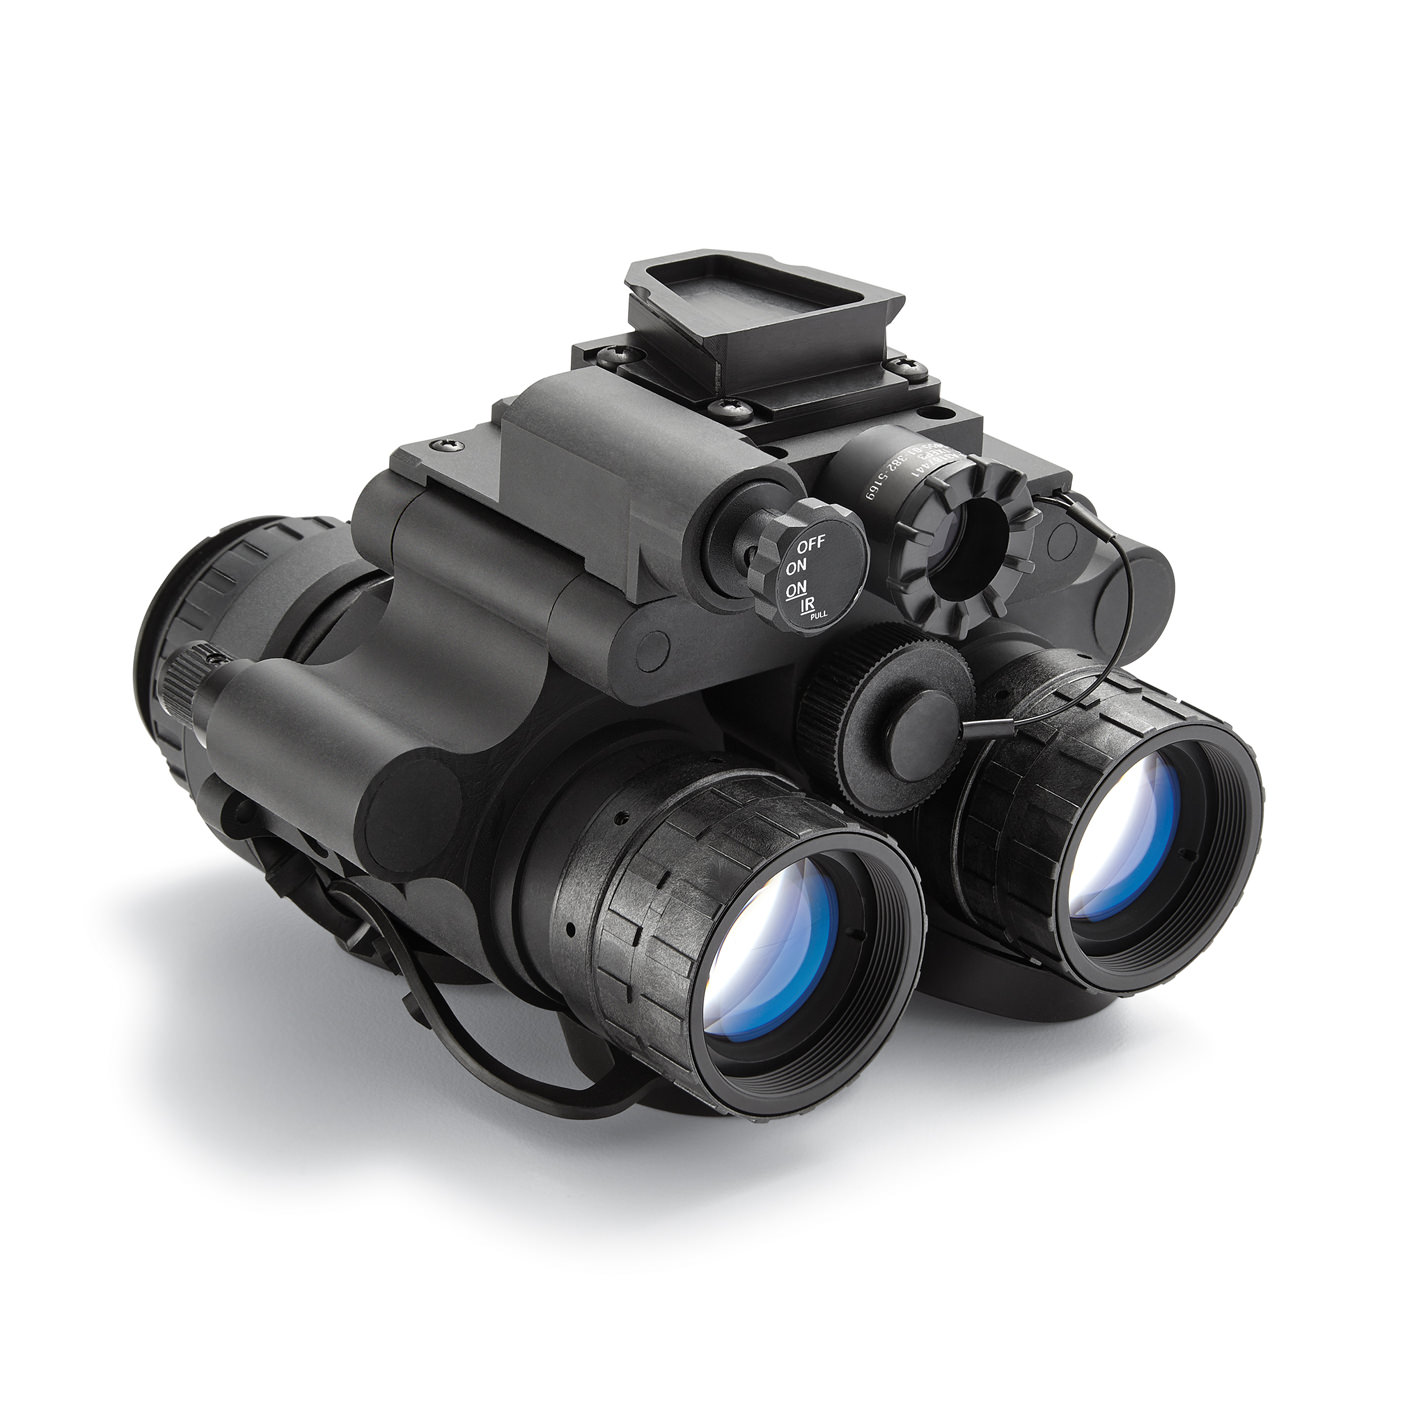 BNVD-DG-SGFK Night Vision Binocular Special Ground Forces Kit